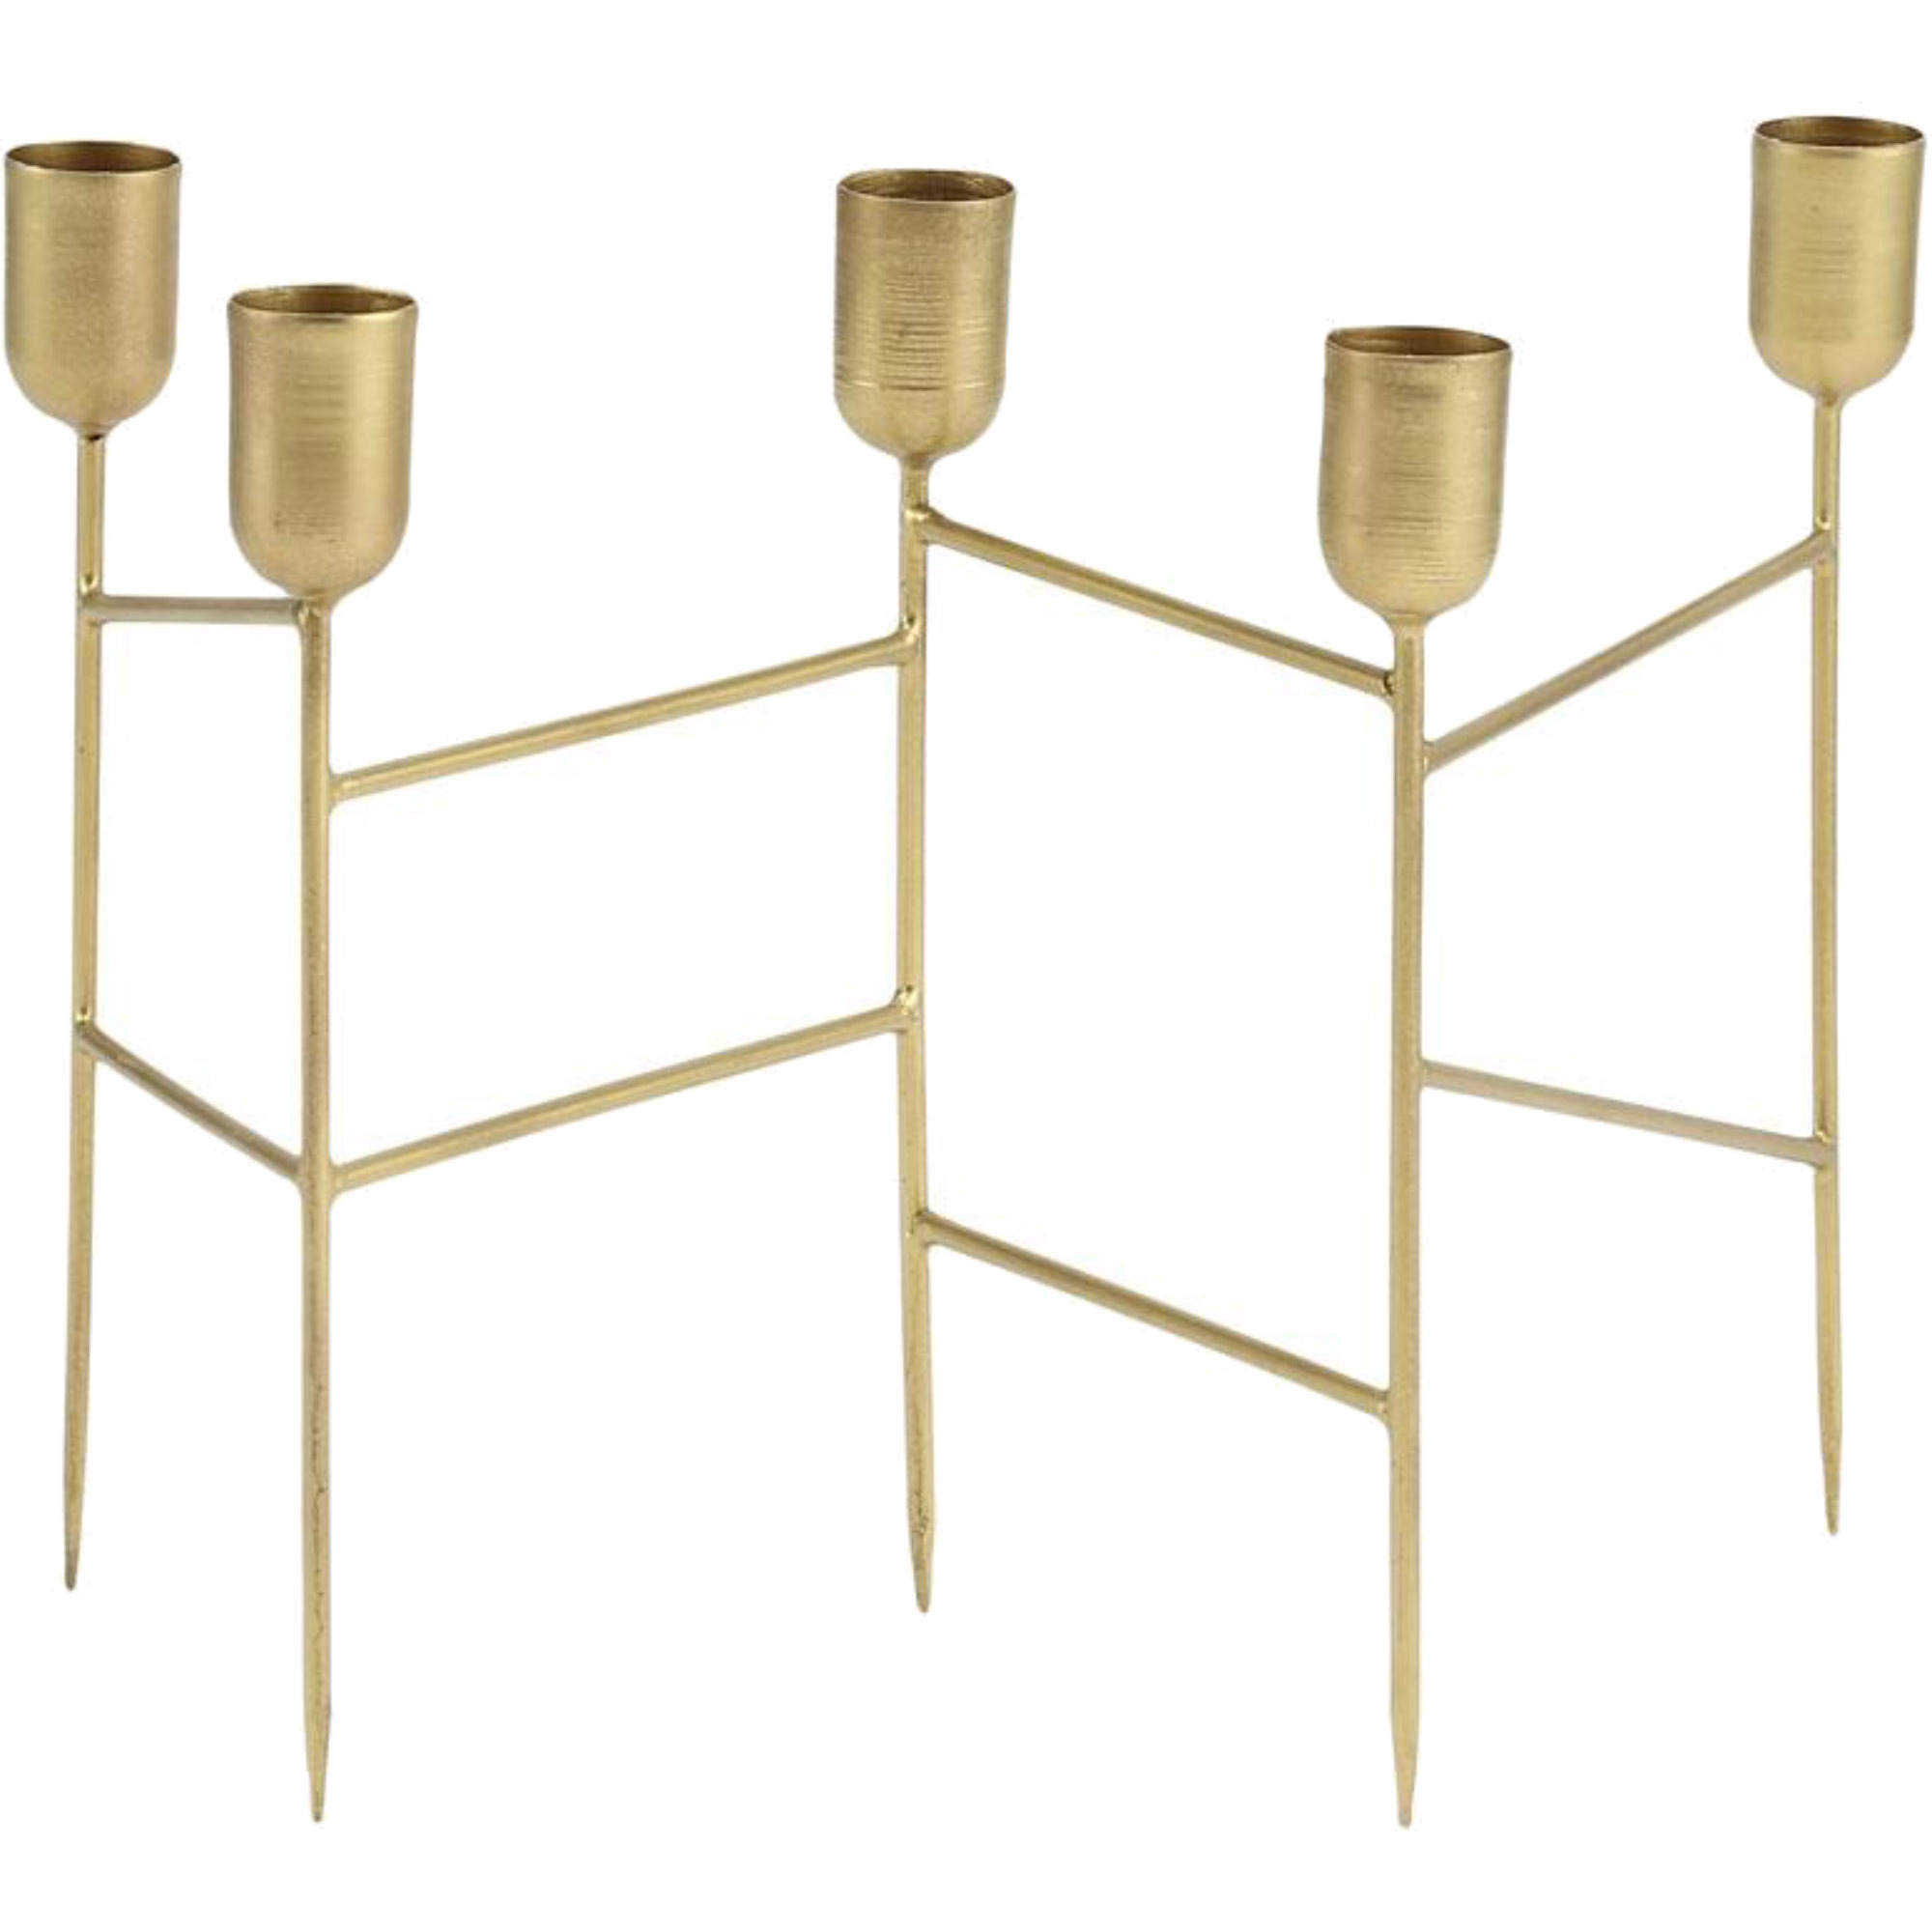 A Simple Mess Ljusstake Spids 22x12,5x19,5 cm Mässing